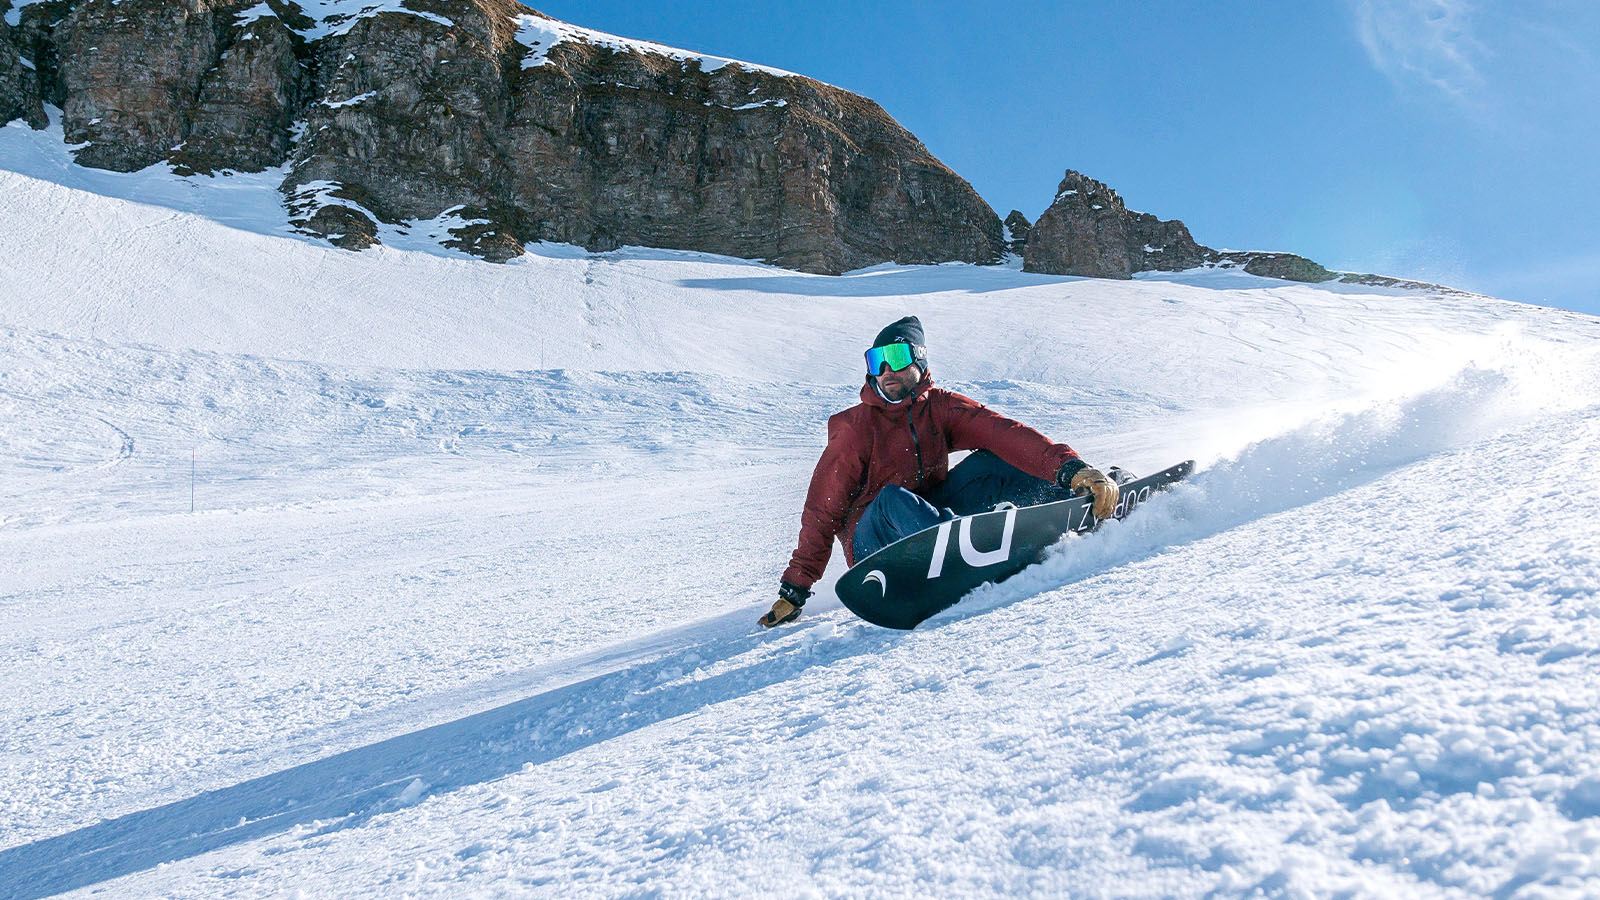 Dupraz FW20/21 Snowboard Preview